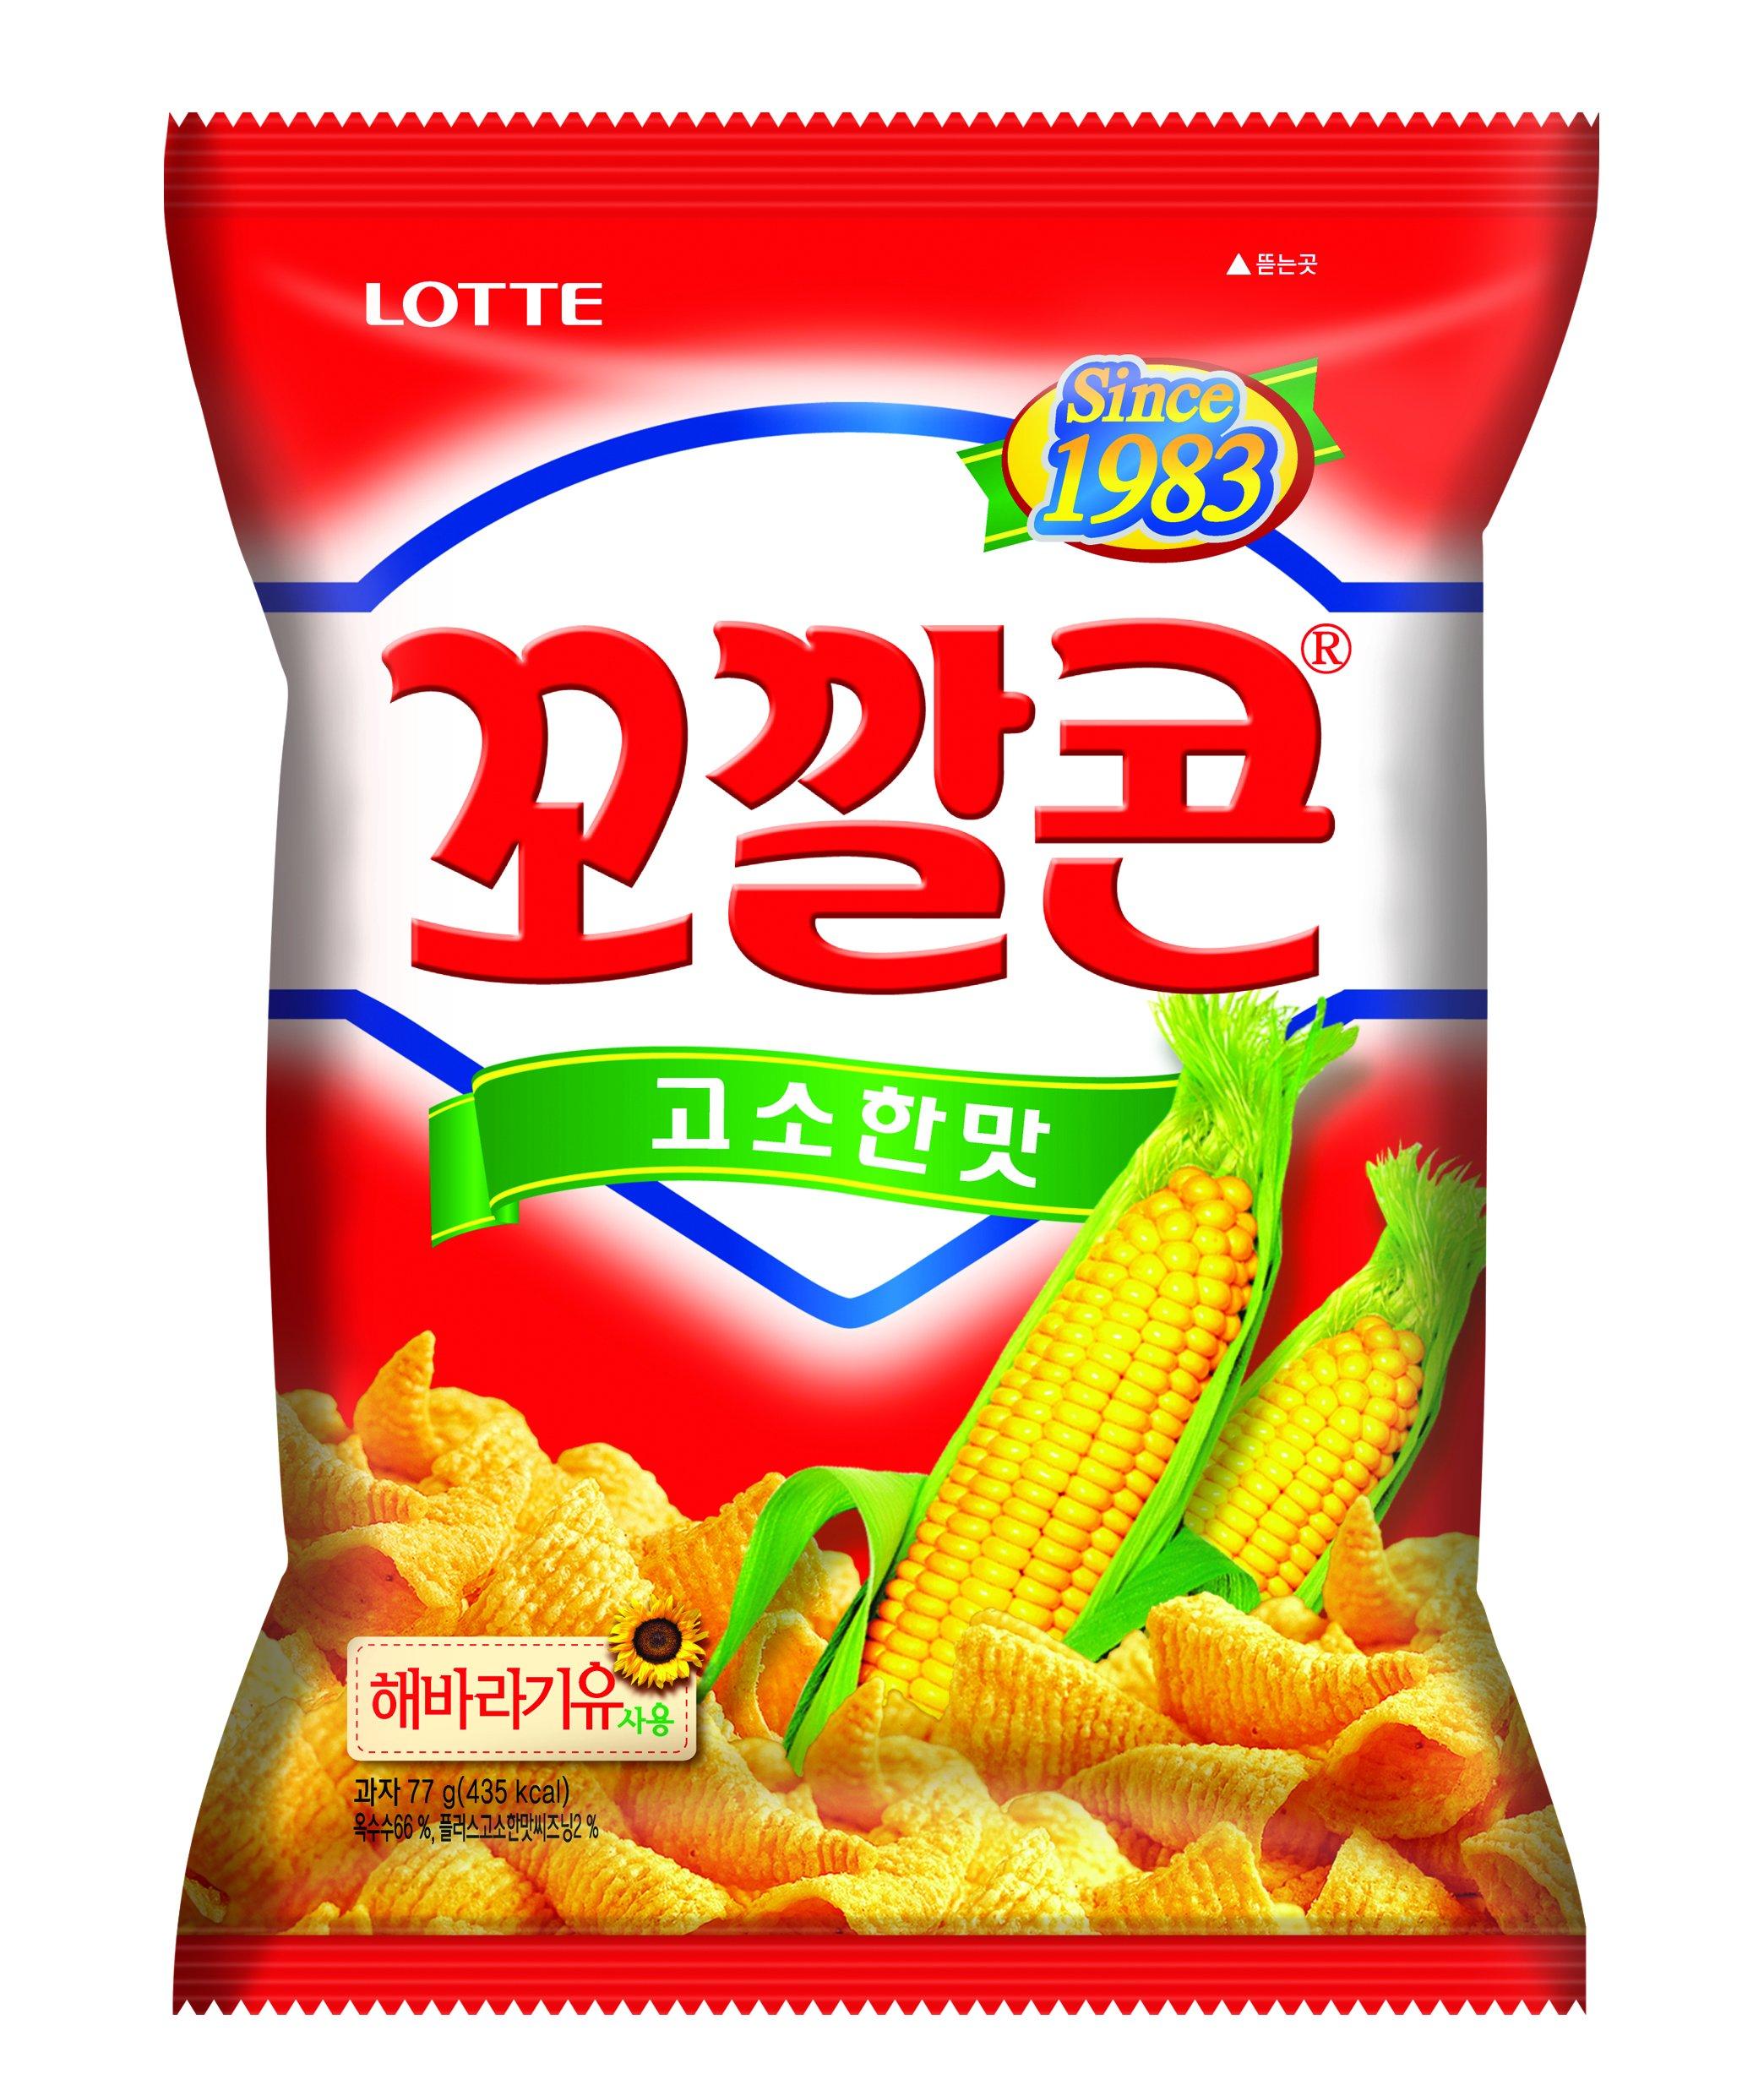 Lotte Kkokkalcorn Original Flavor